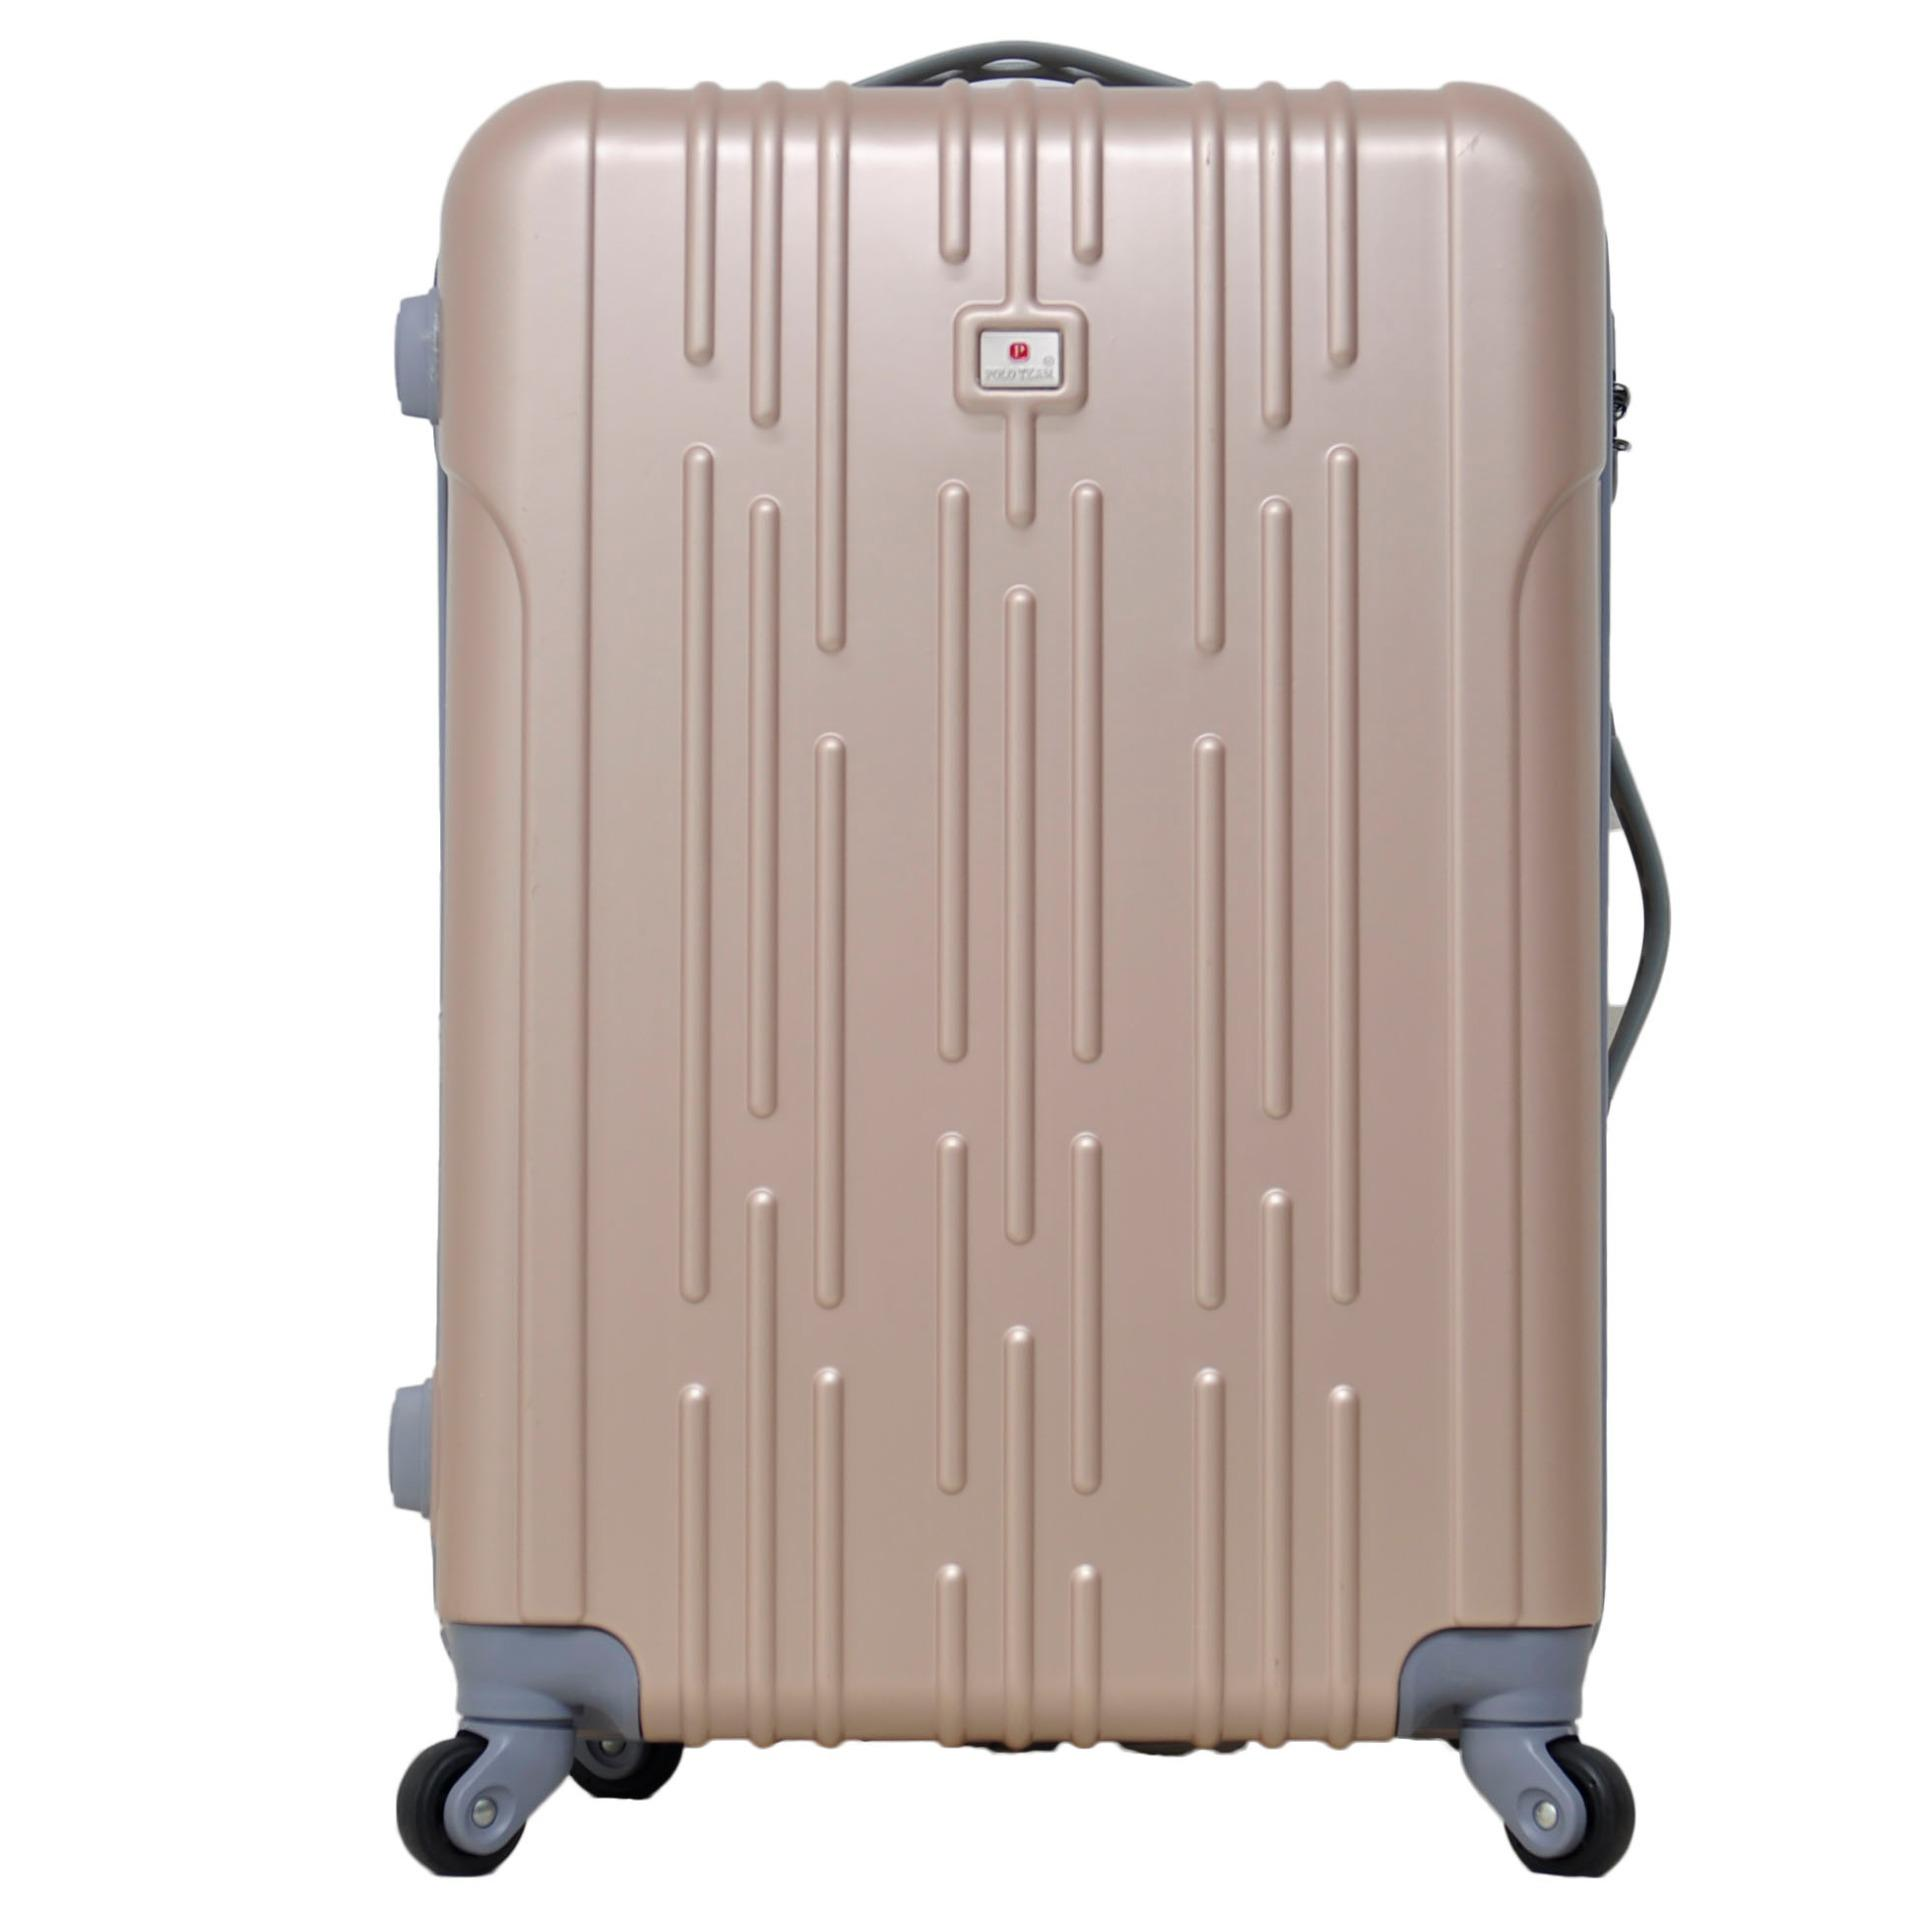 Beli Polo Team Tas Koper Hardcase Size 24 Inch 005 Cokelat Gold Cicilan